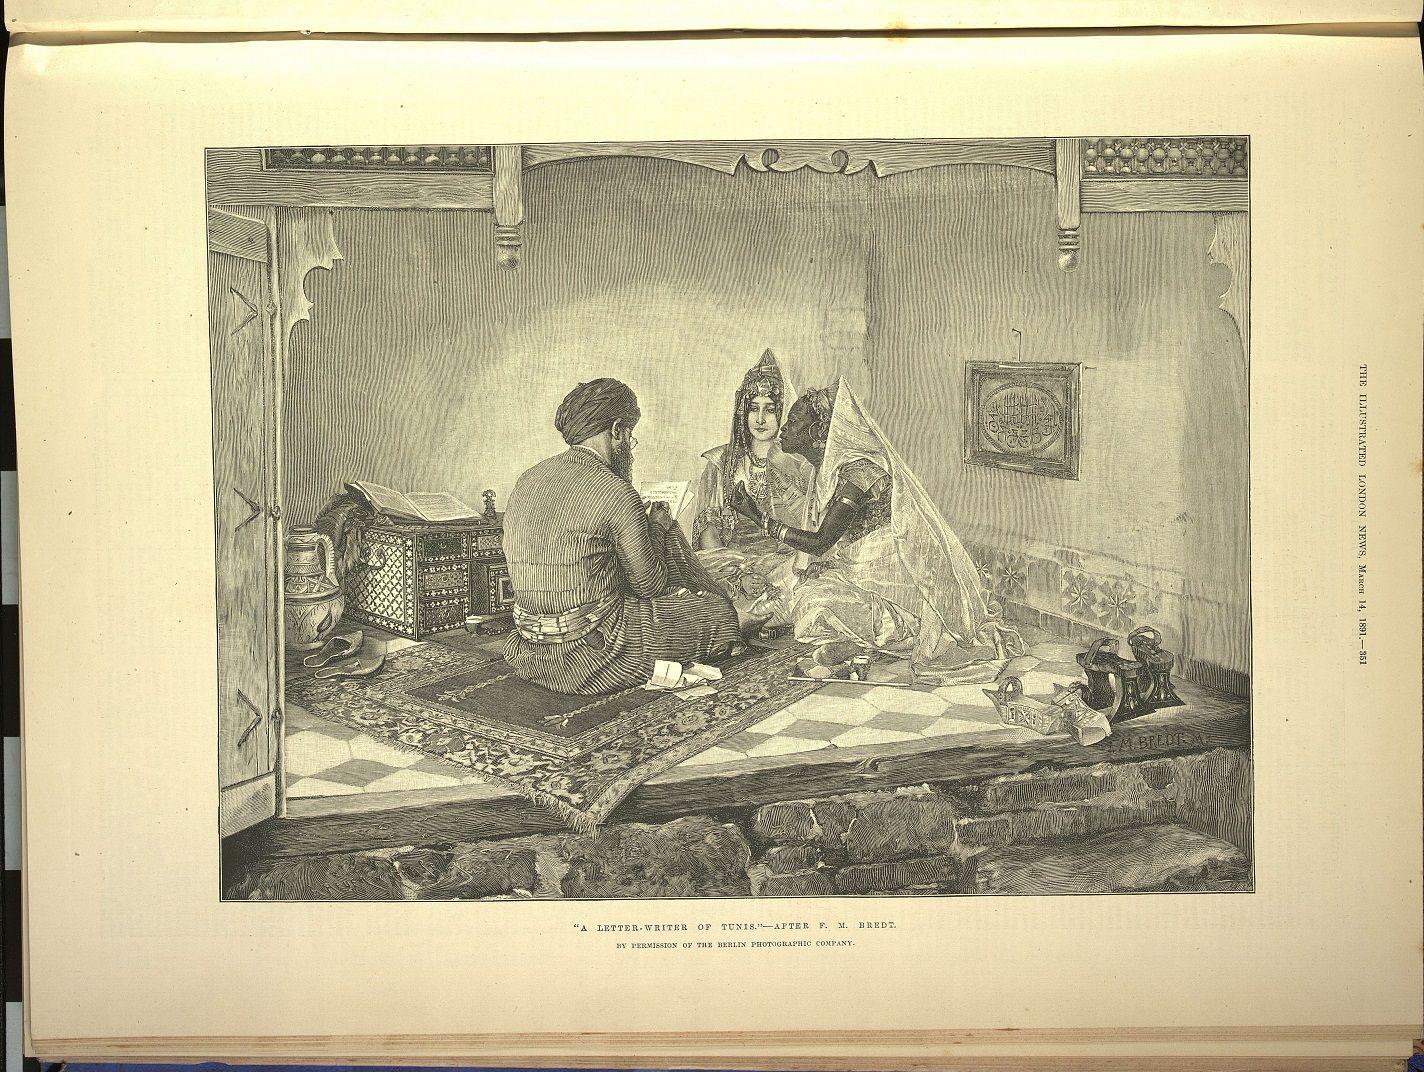 The Illustrated London News. London: Illustrated London News & Sketch Ltd., 1842- p.351 de 1891